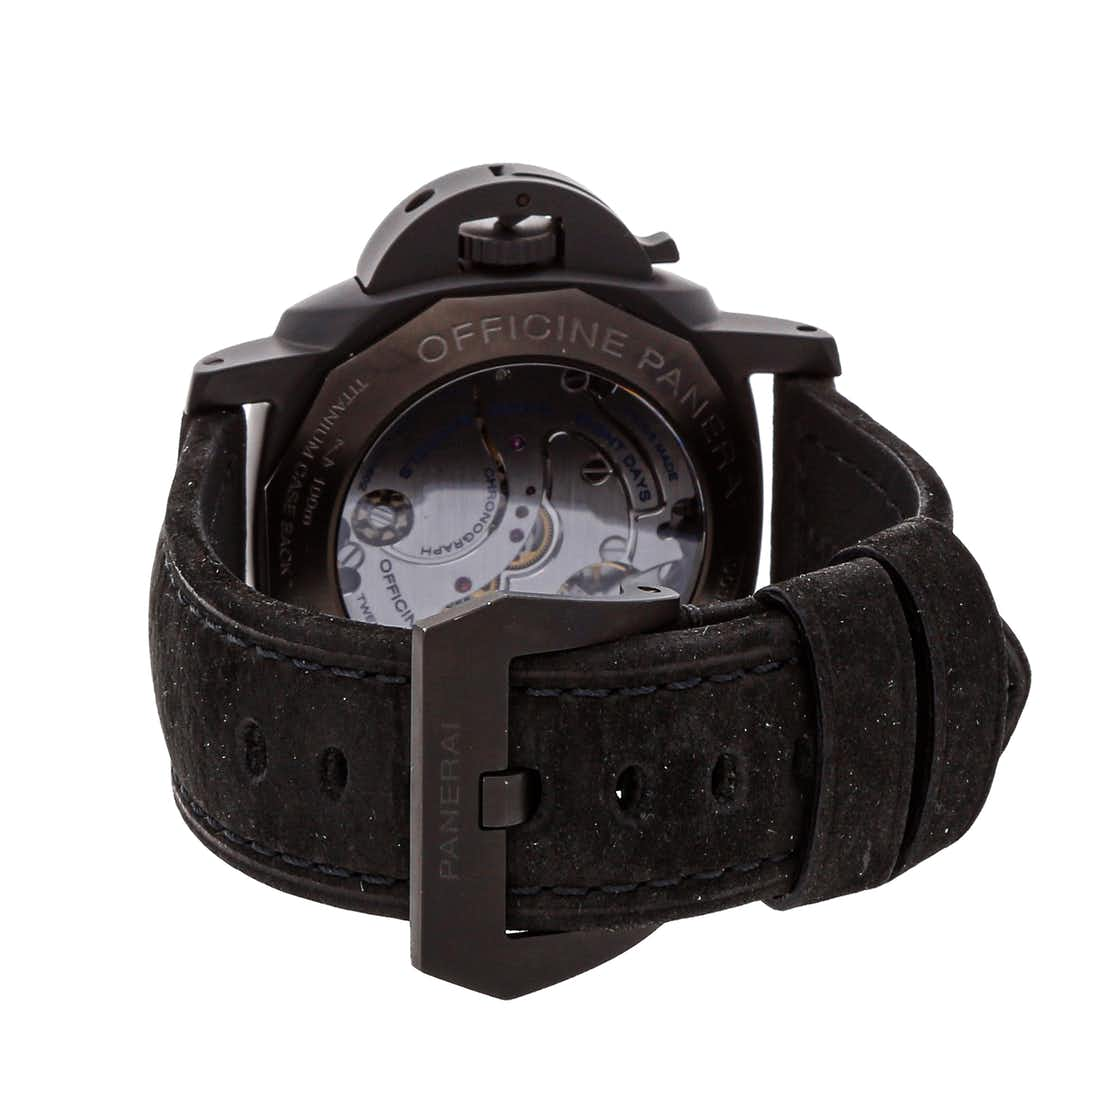 "Panerai Luminor 1950 Moonpulsante GMT 8-Days ""The Black Night"" Limited Edition PAM 317"